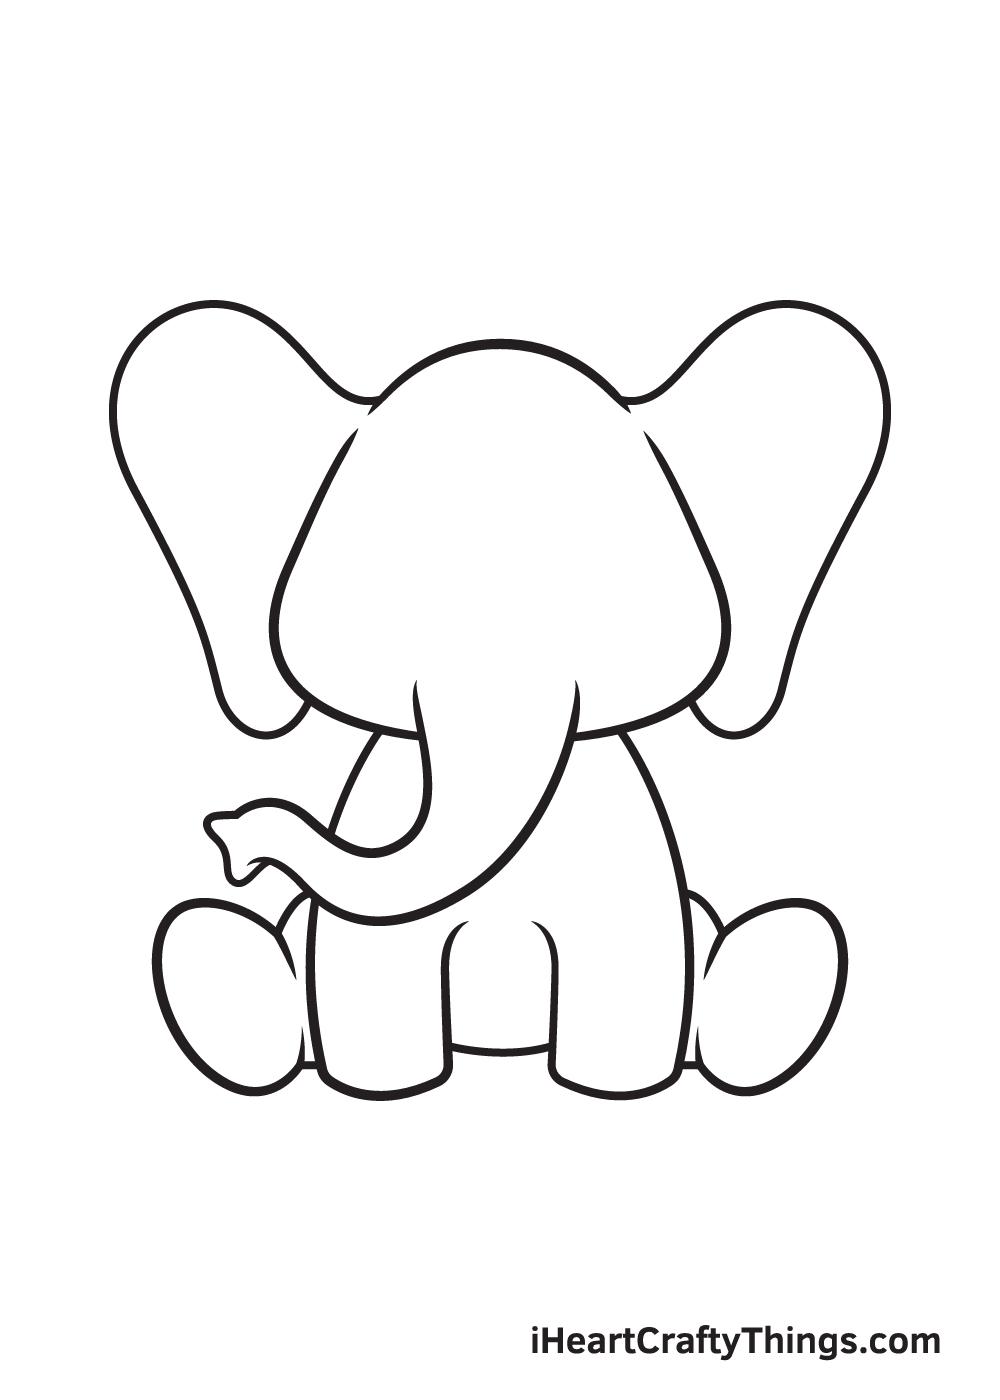 Elephant Drawing – Step 7